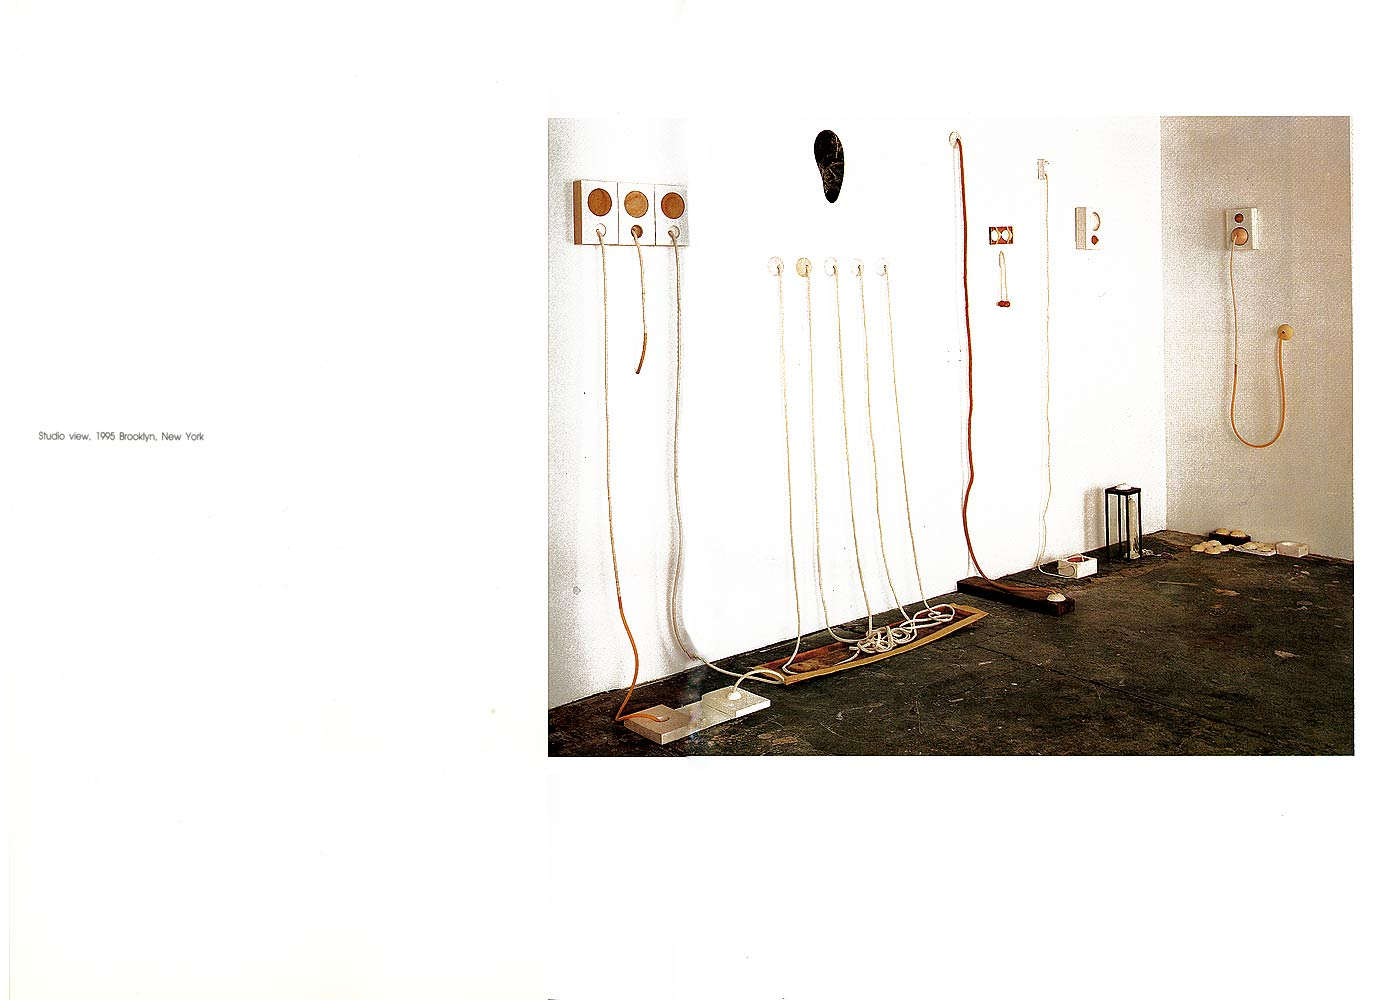 Mikyung Kim, catalog, studio view